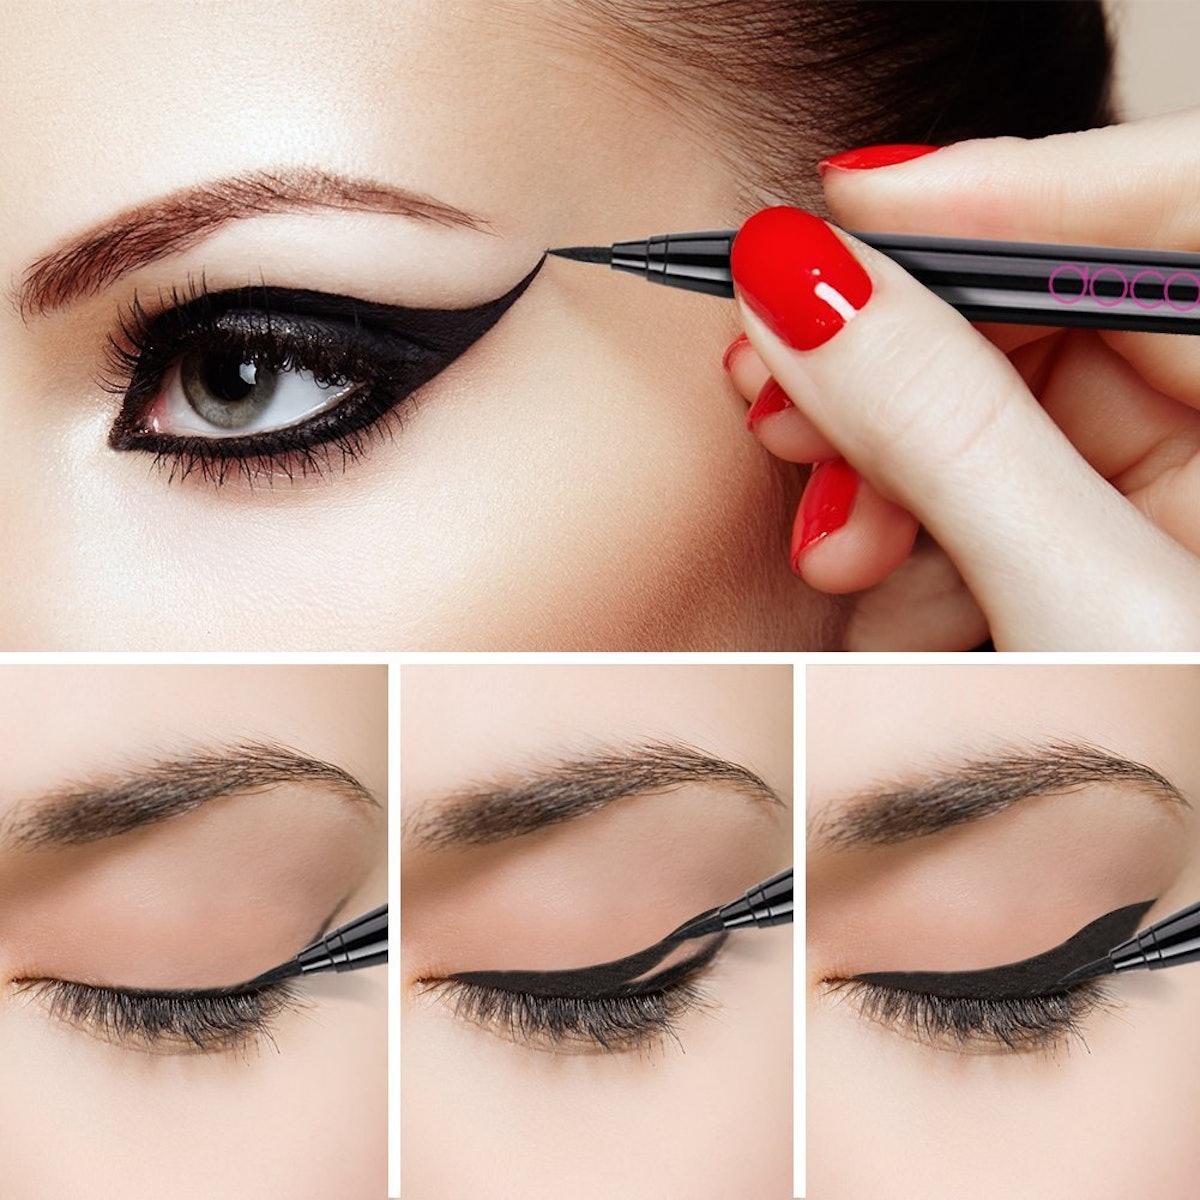 Docolor Liquid Eyeliner